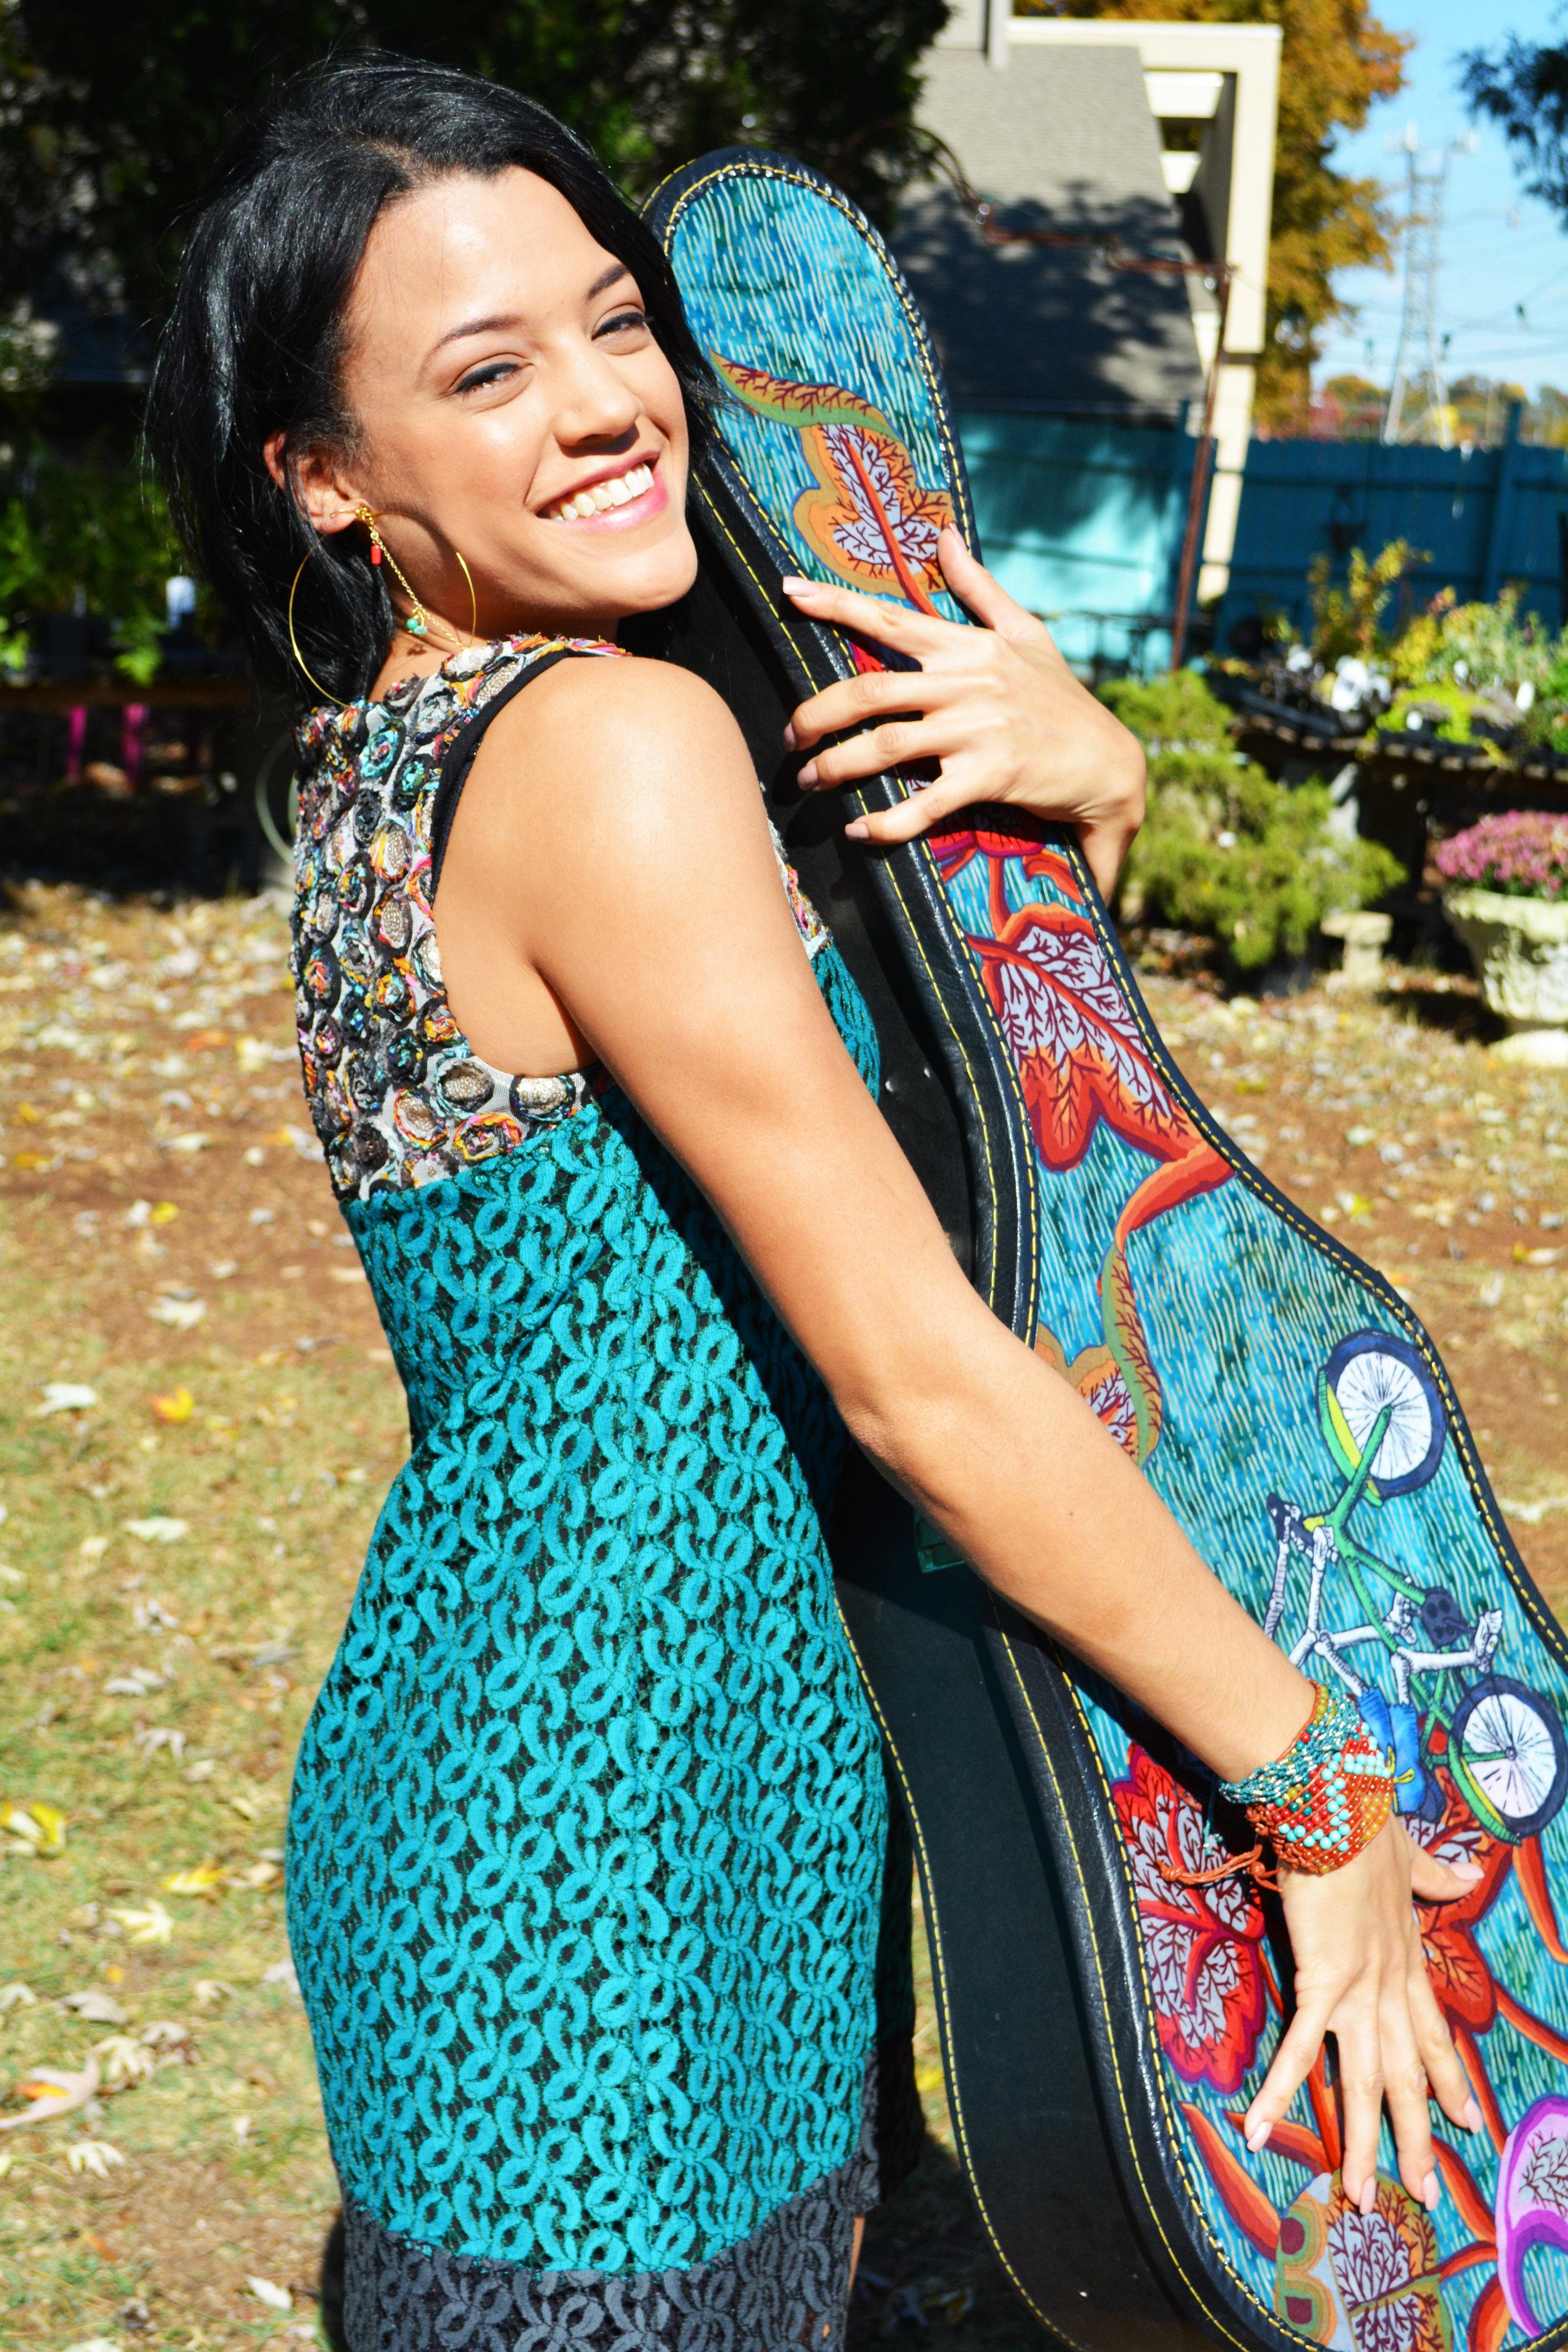 MEGAN blue dress 3.jpg